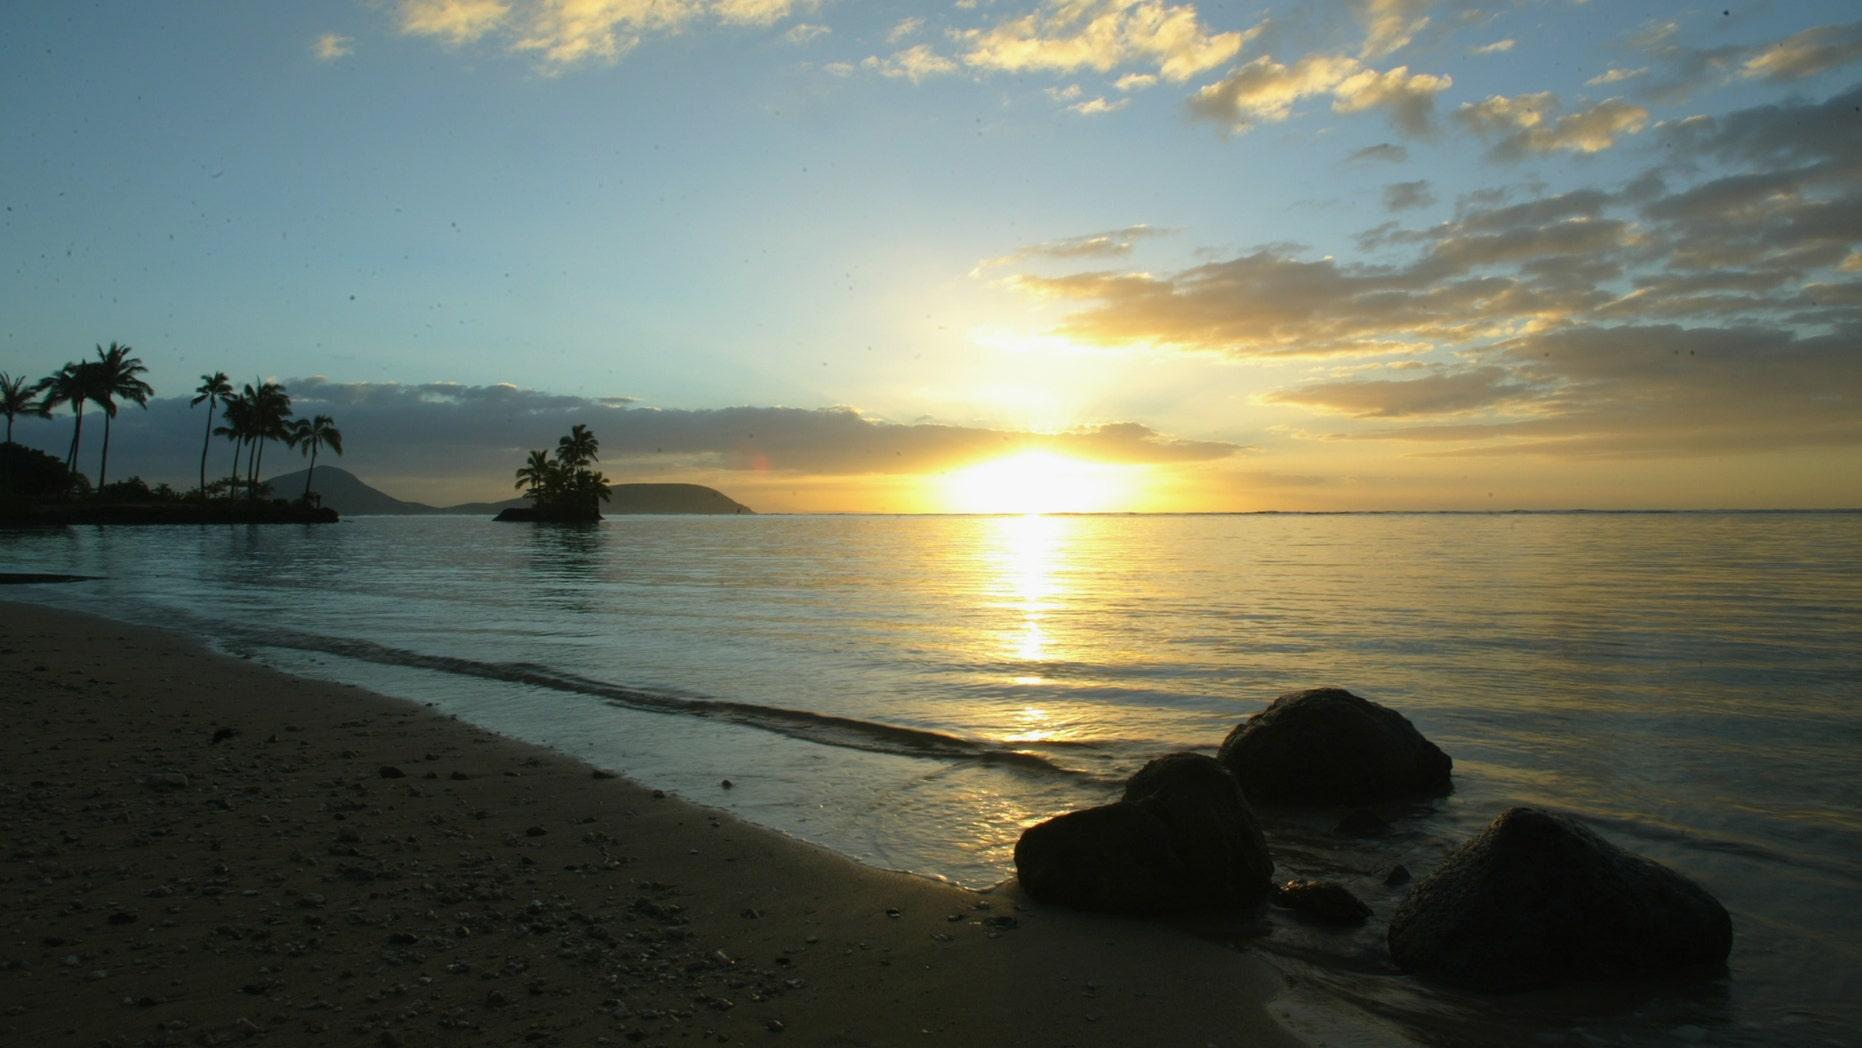 Waikiki beach in Honolulu, Hawaii. (Photo by Donald Miralle/Getty Images)